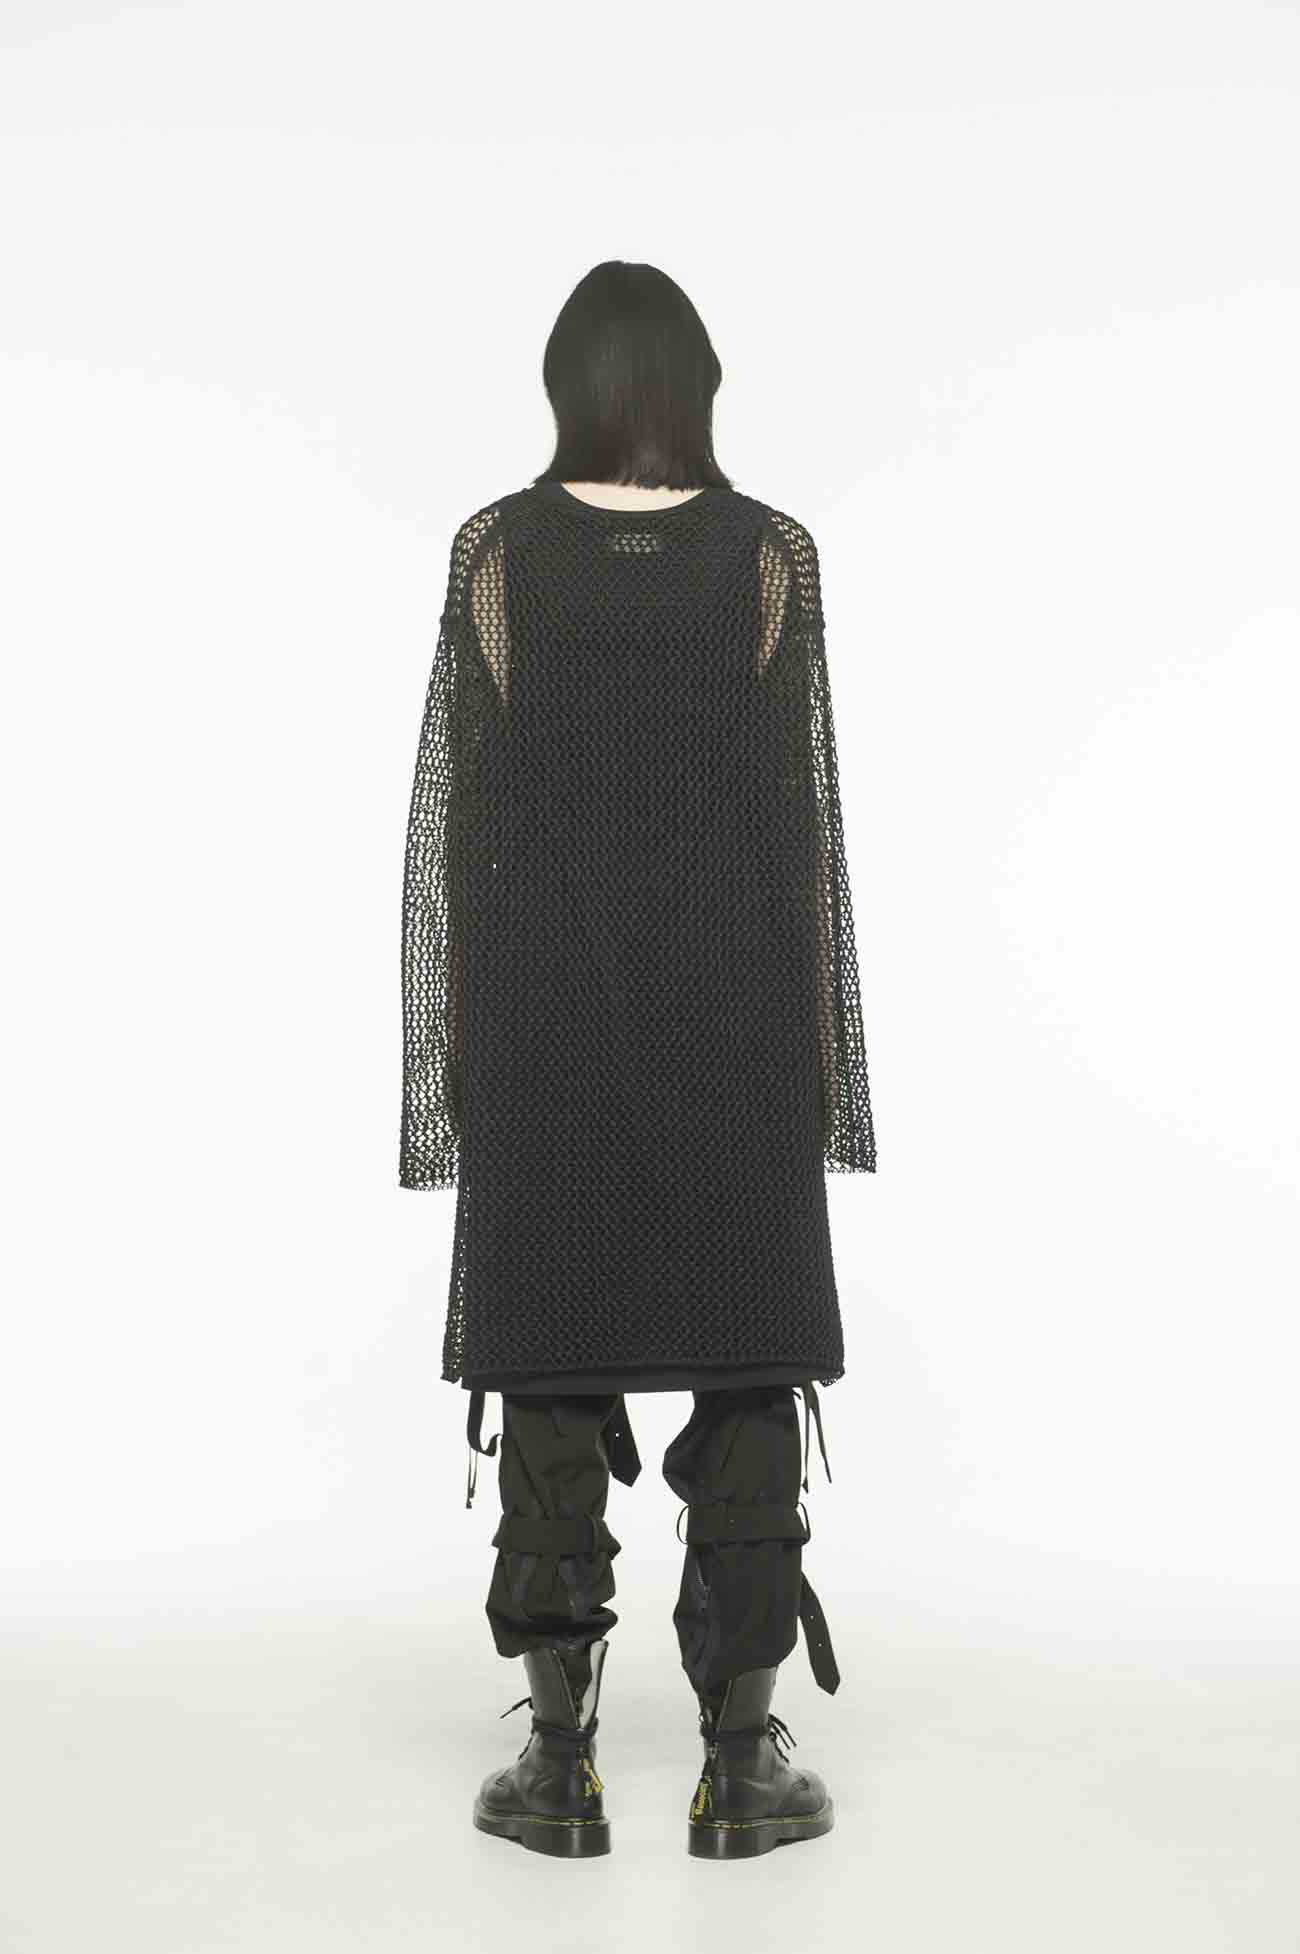 Straw Yarn Mesh Knitting Raglan Pullover